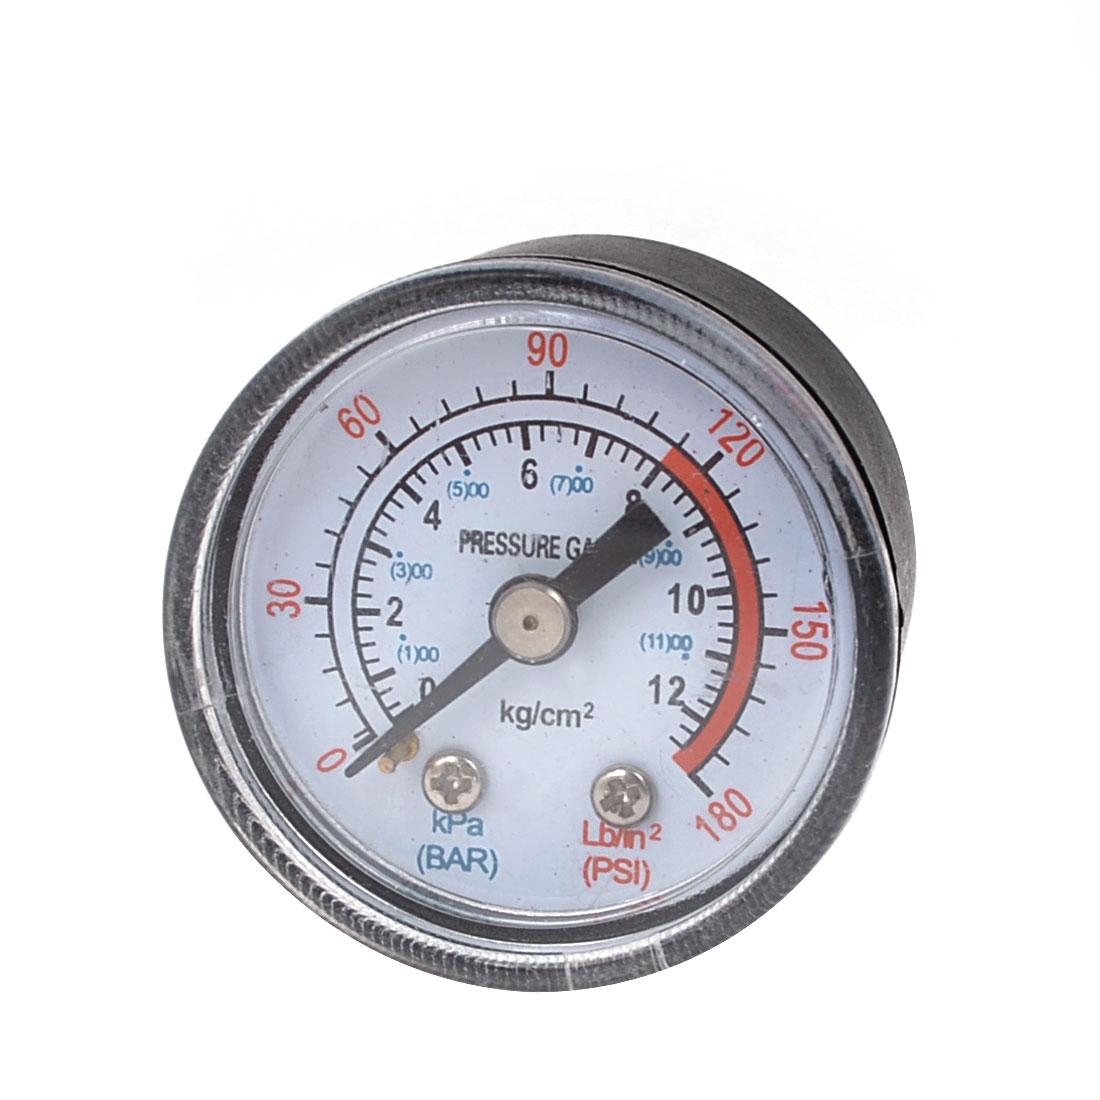 0-180psi 0-12 bar 10mm Male Thread Black Metal Case Pneumatic Pressure Gauge